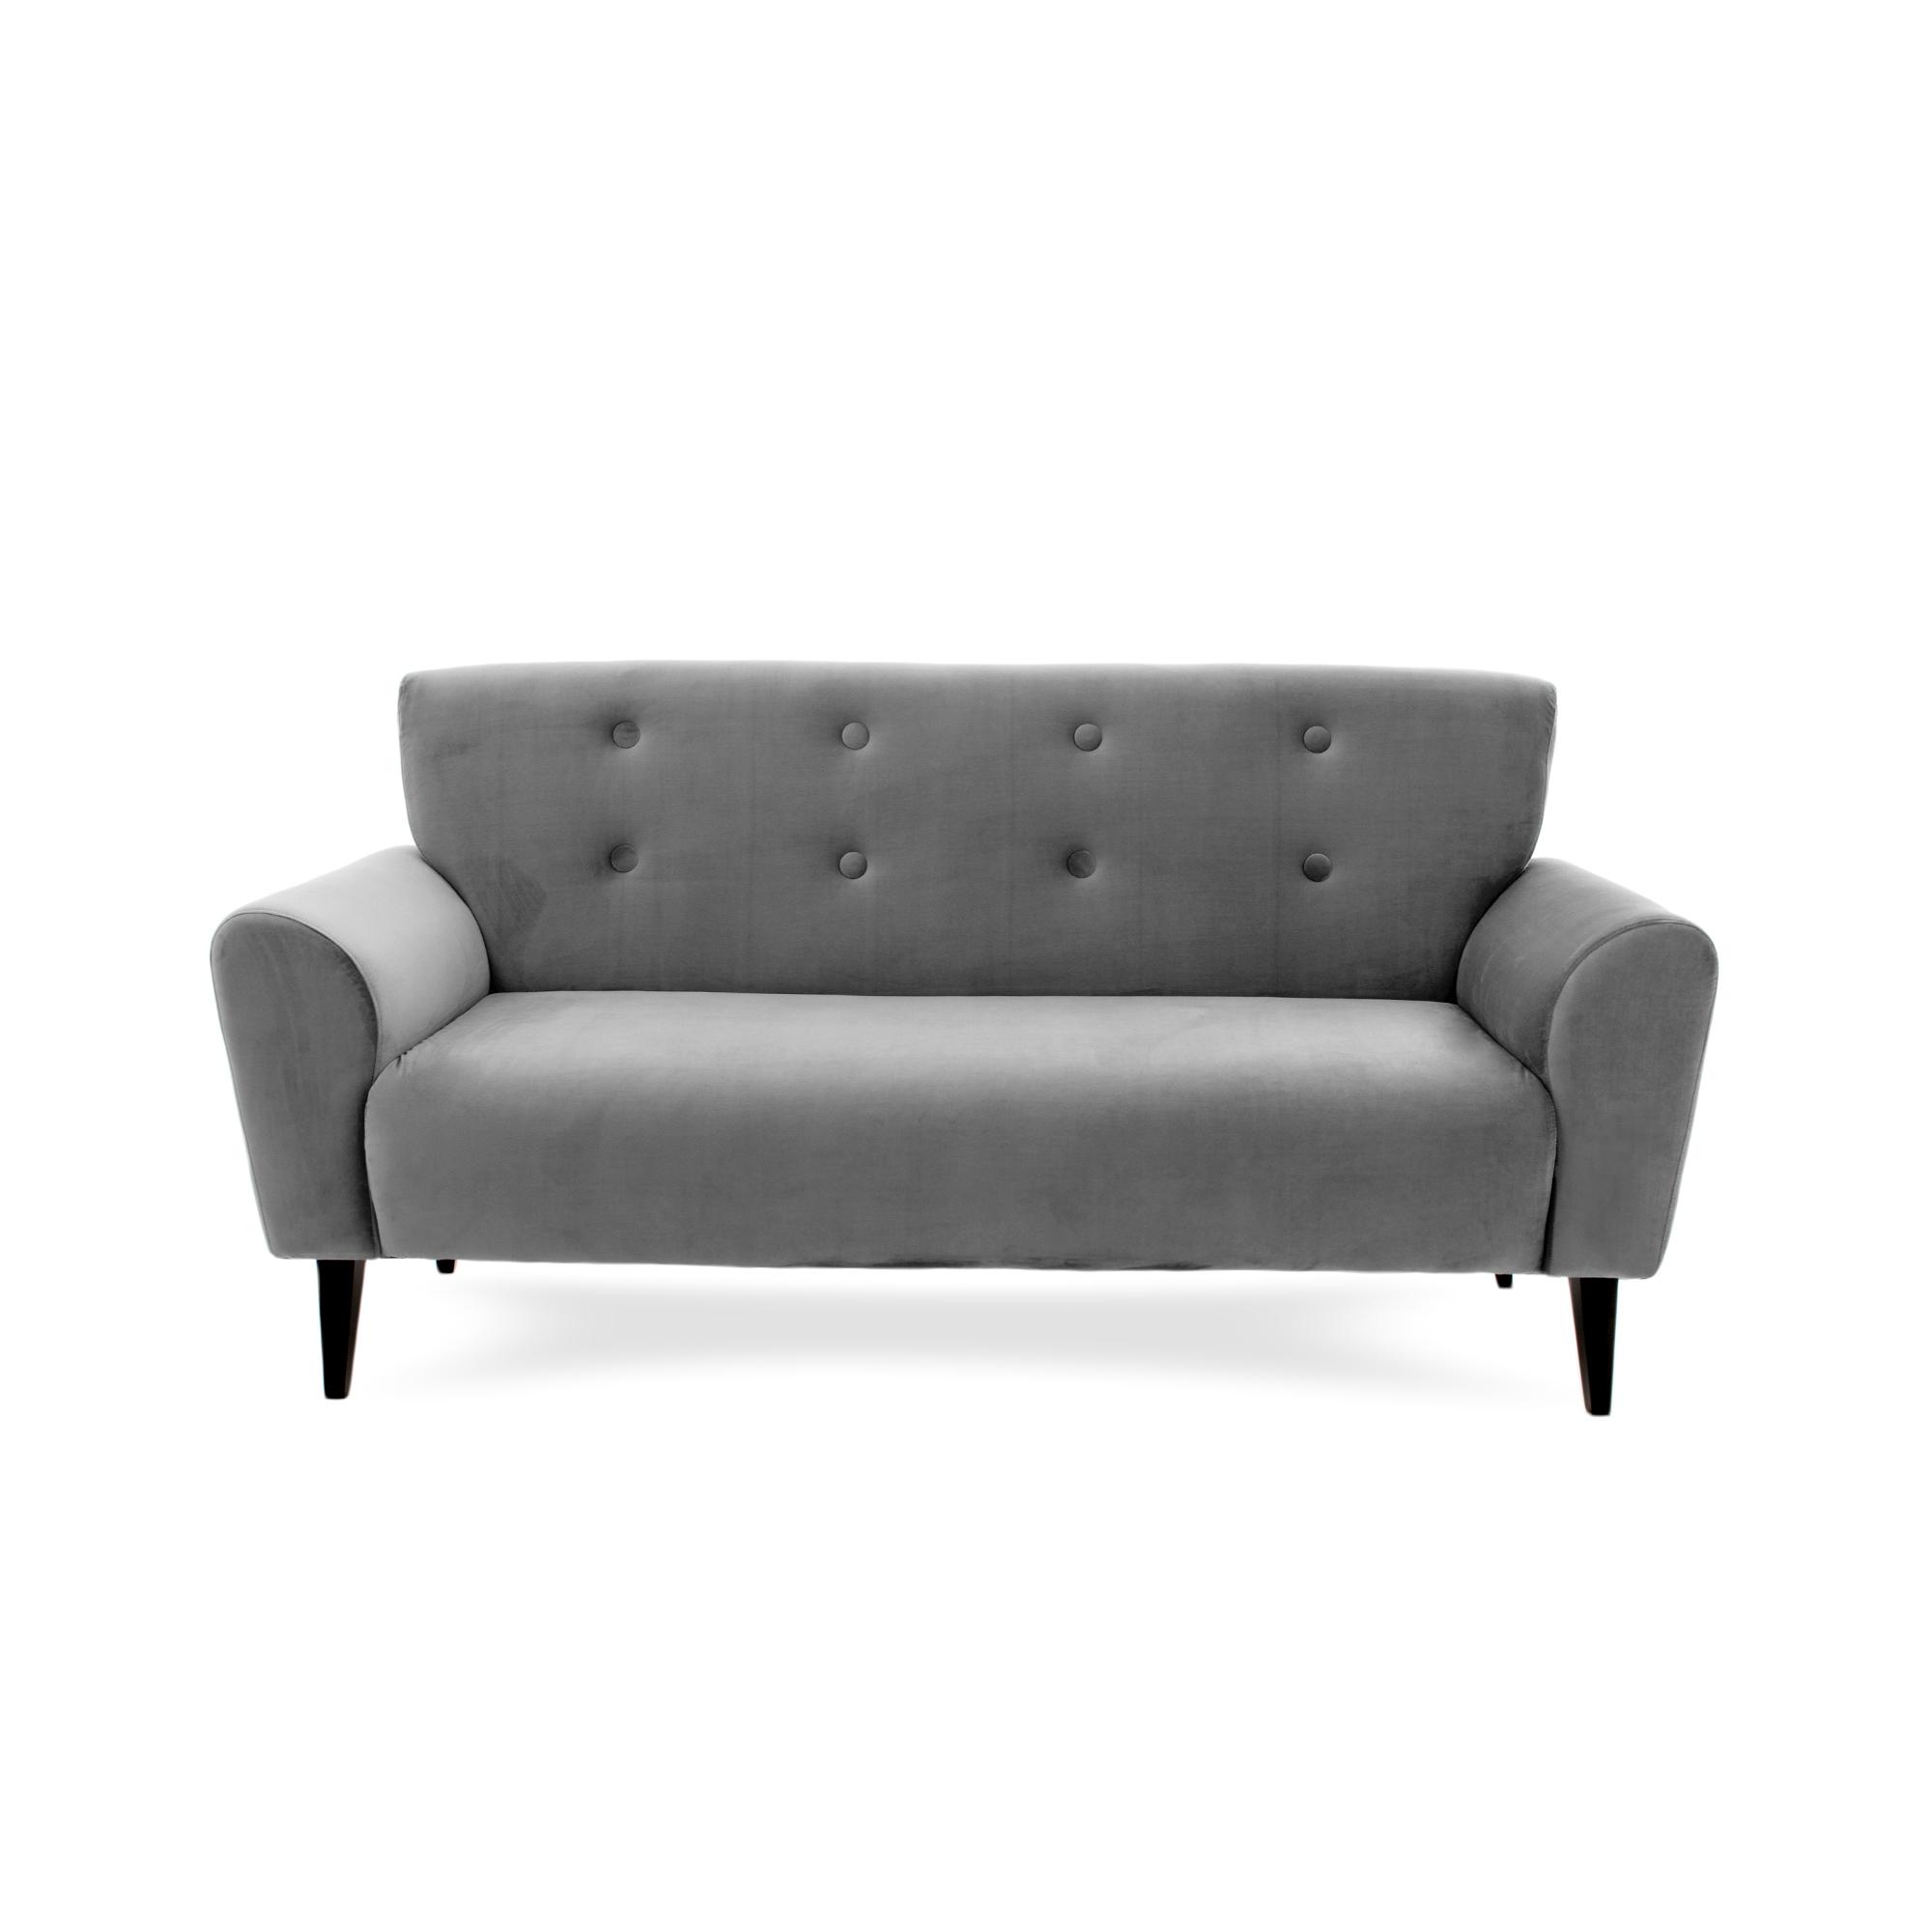 Canapea Fixa 3 locuri Kiara Silver